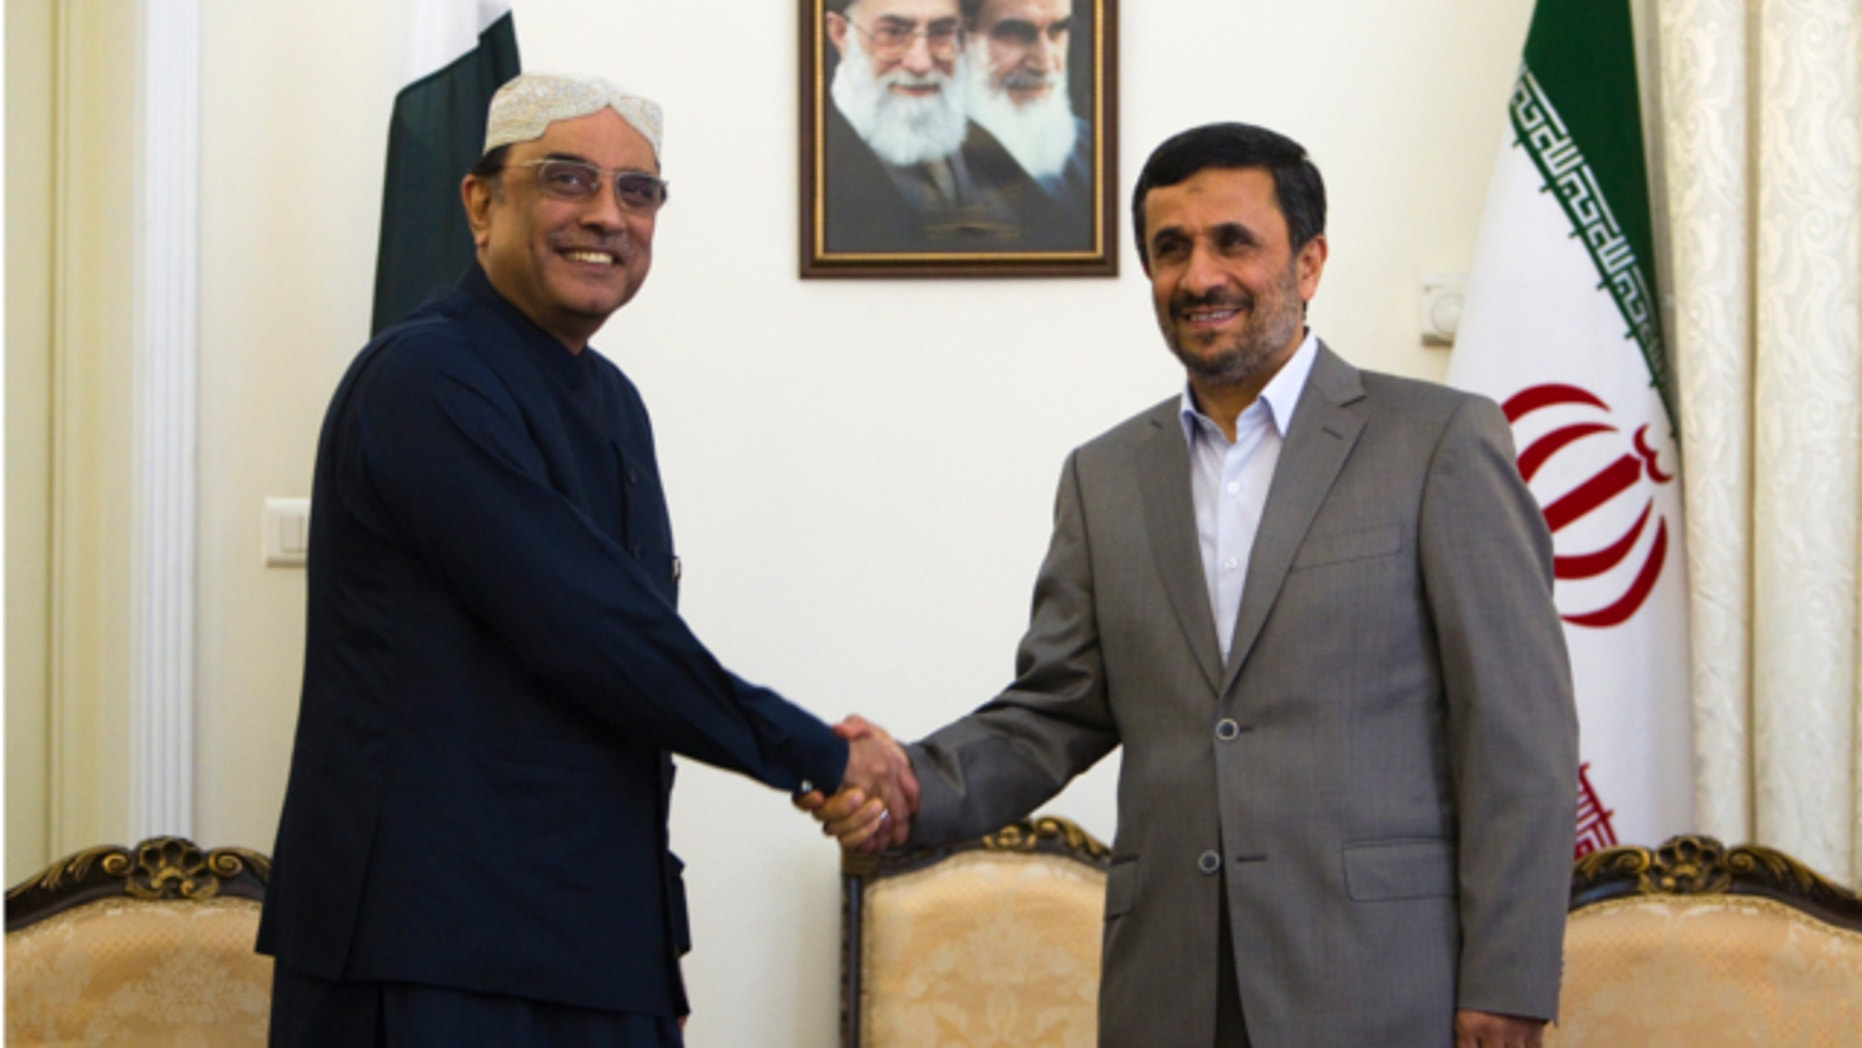 July 16, 2011: Iran's President Mahmoud Ahmadinejad (R) shakes hands with his Pakistani counterpart Asif Ali Zardari during a meeting in Tehran